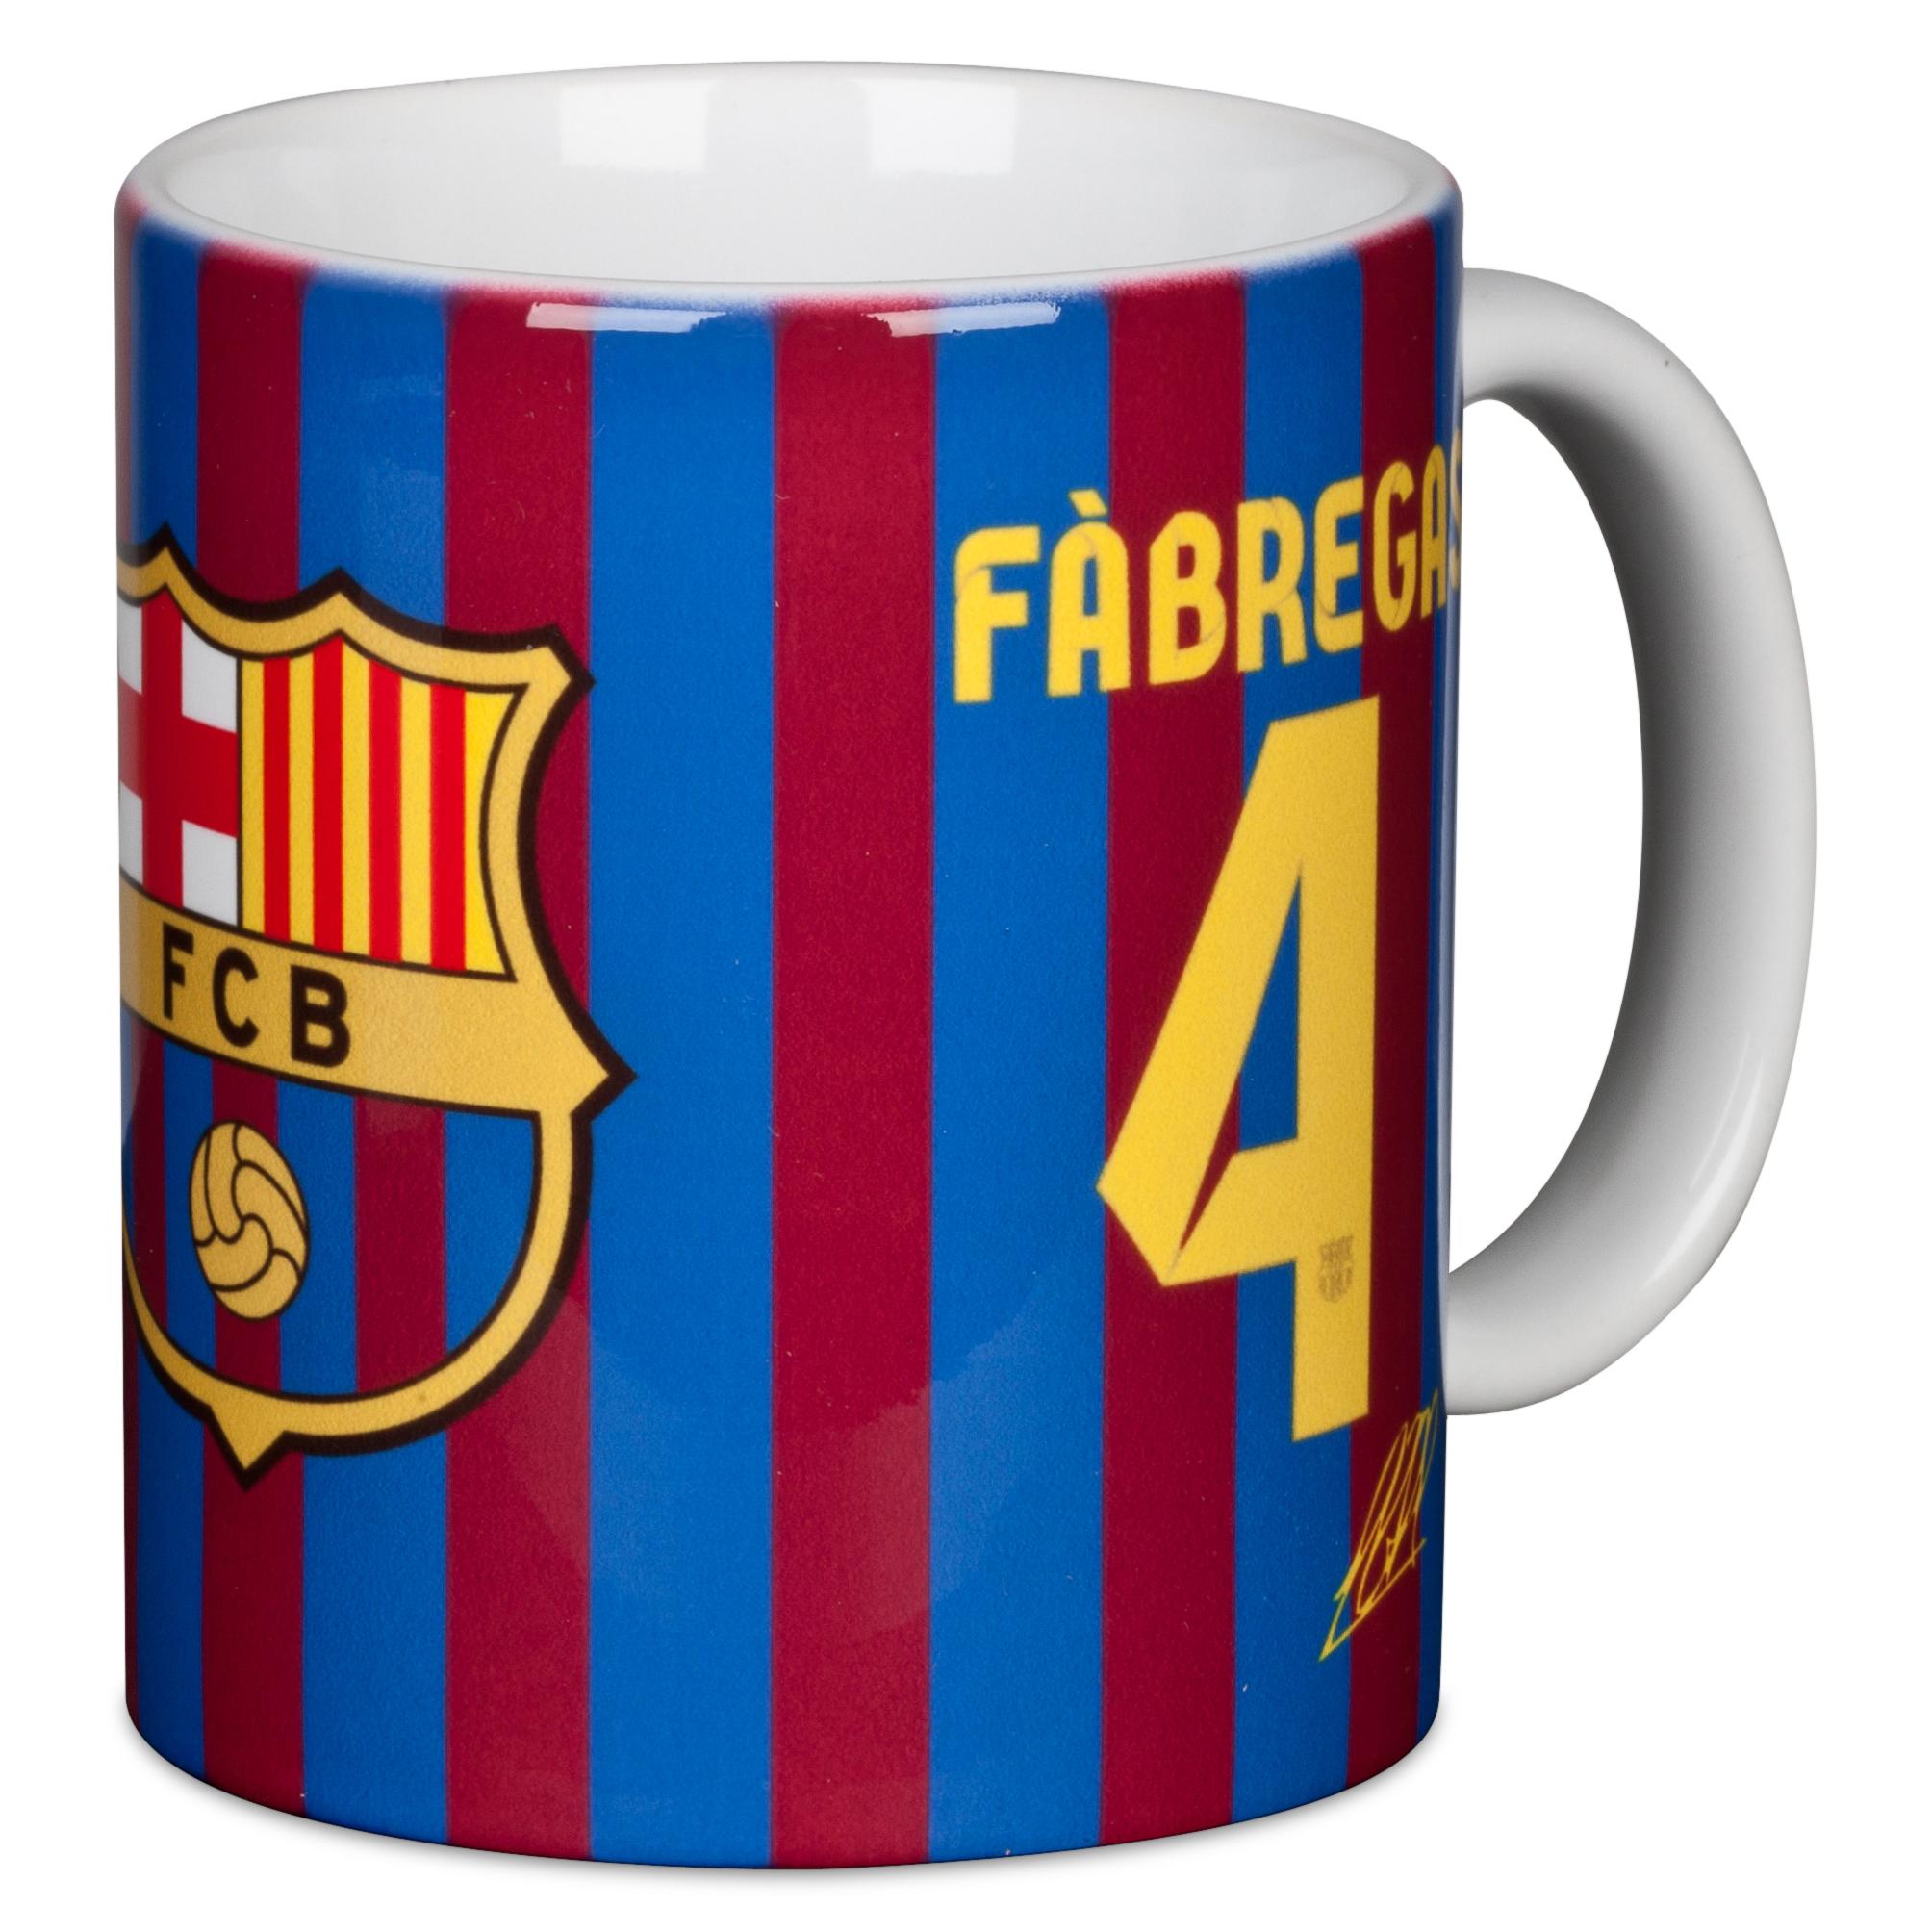 Barcelona 2012/13 Fabregas Mug